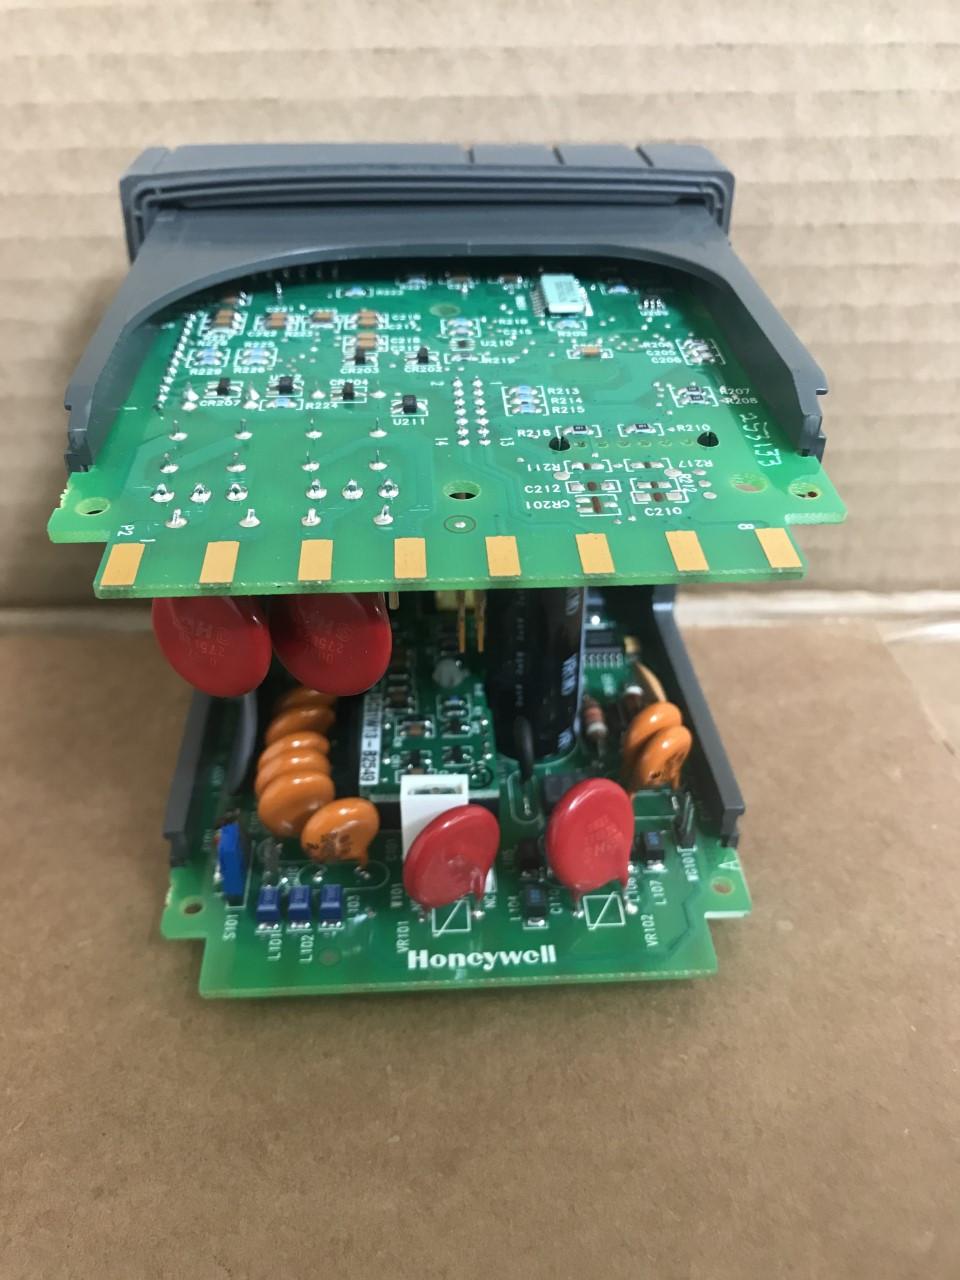 HONEYWELL DC230B-CE-10-0000000-E0-0  MINI-PRO Controller UDC2300